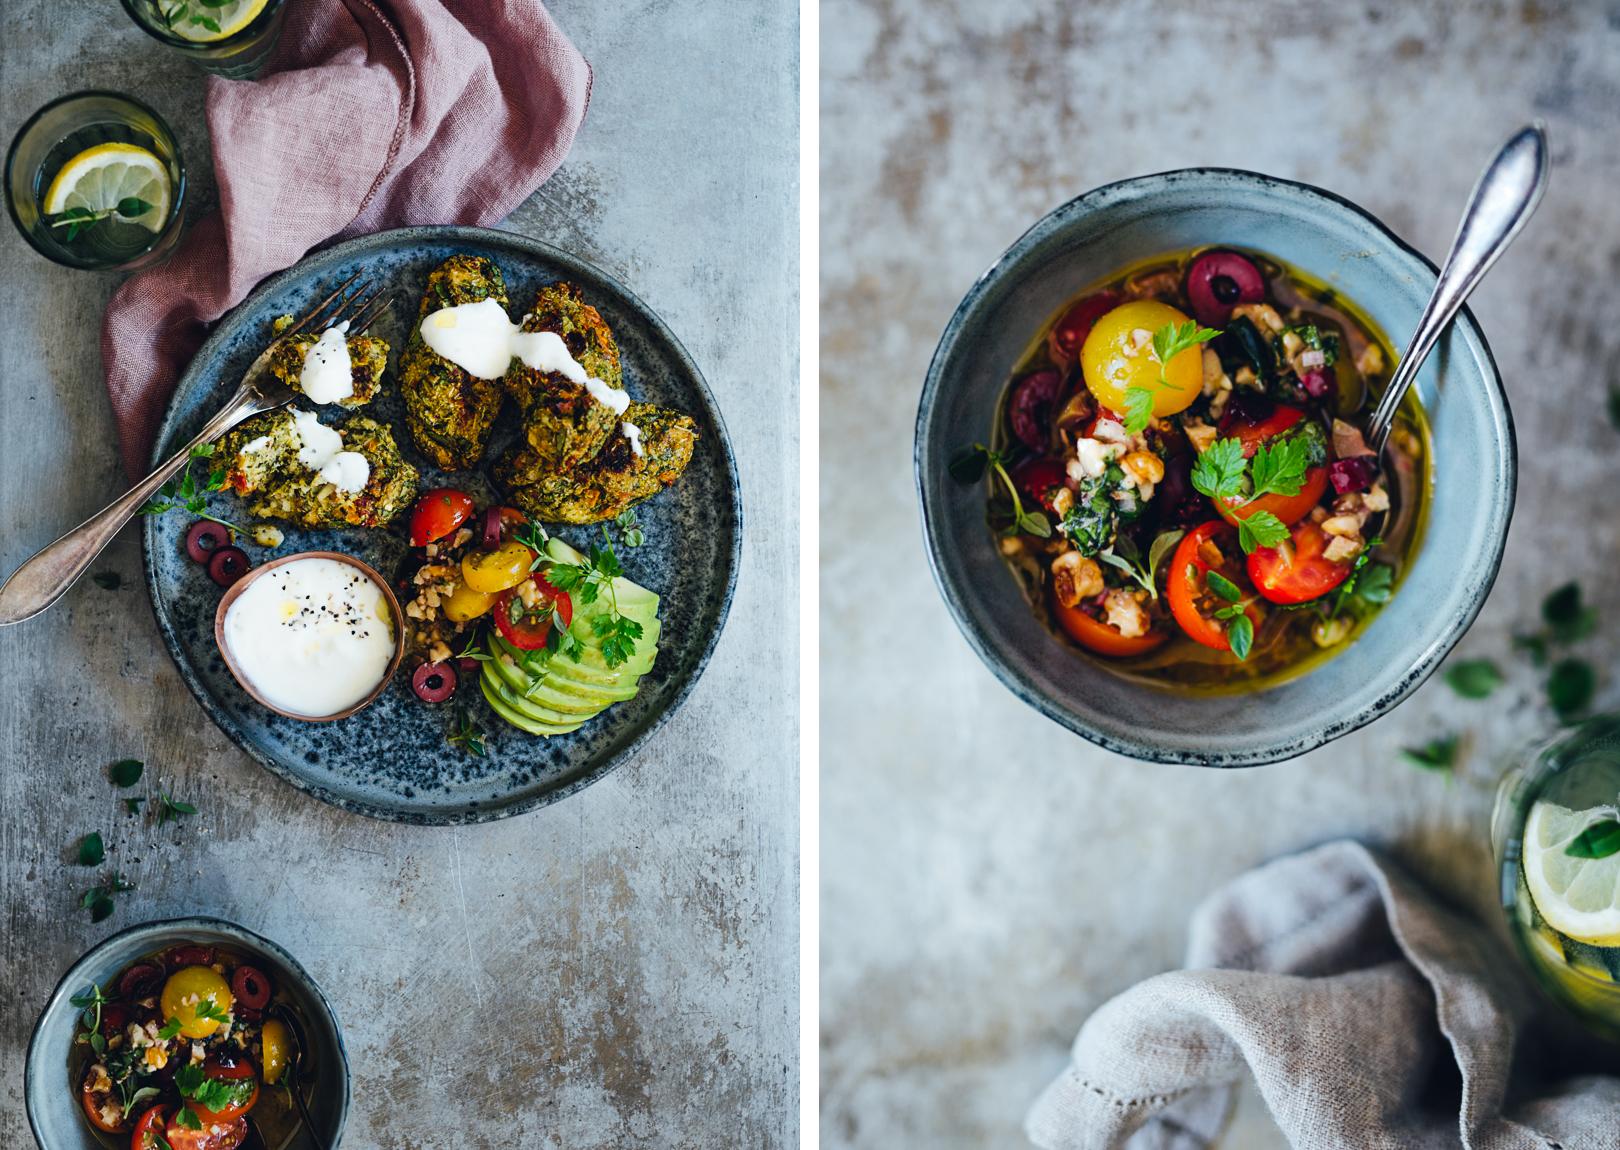 Broccoli & Feta Patties with Tomato Olive Salsa | Cashew Kitchen